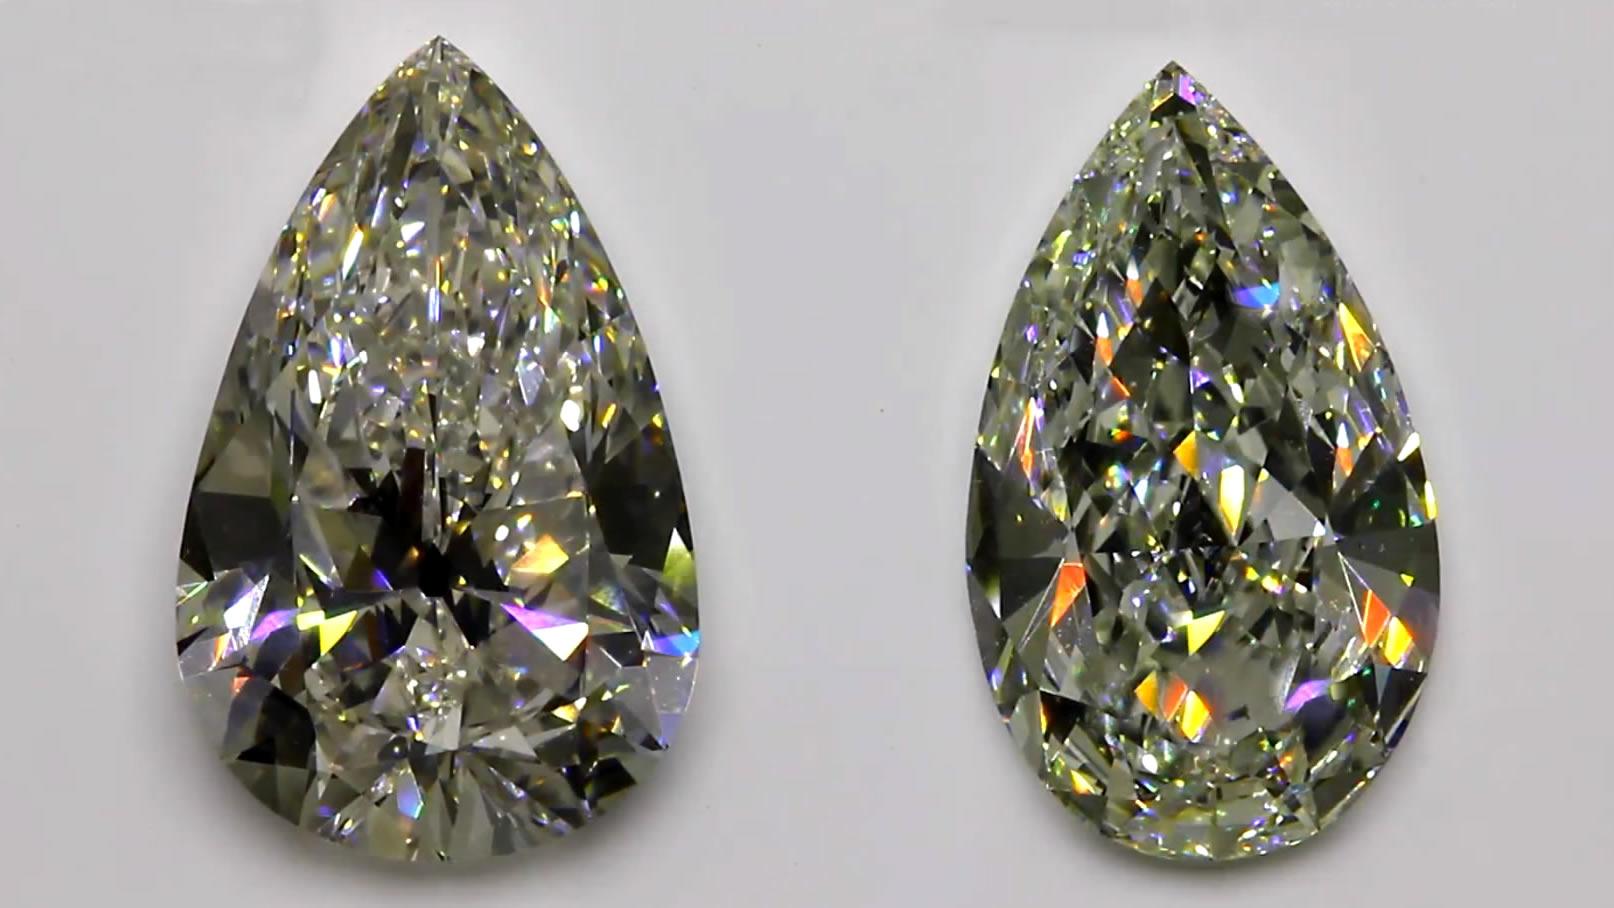 Pear shaped diamonds - a guide